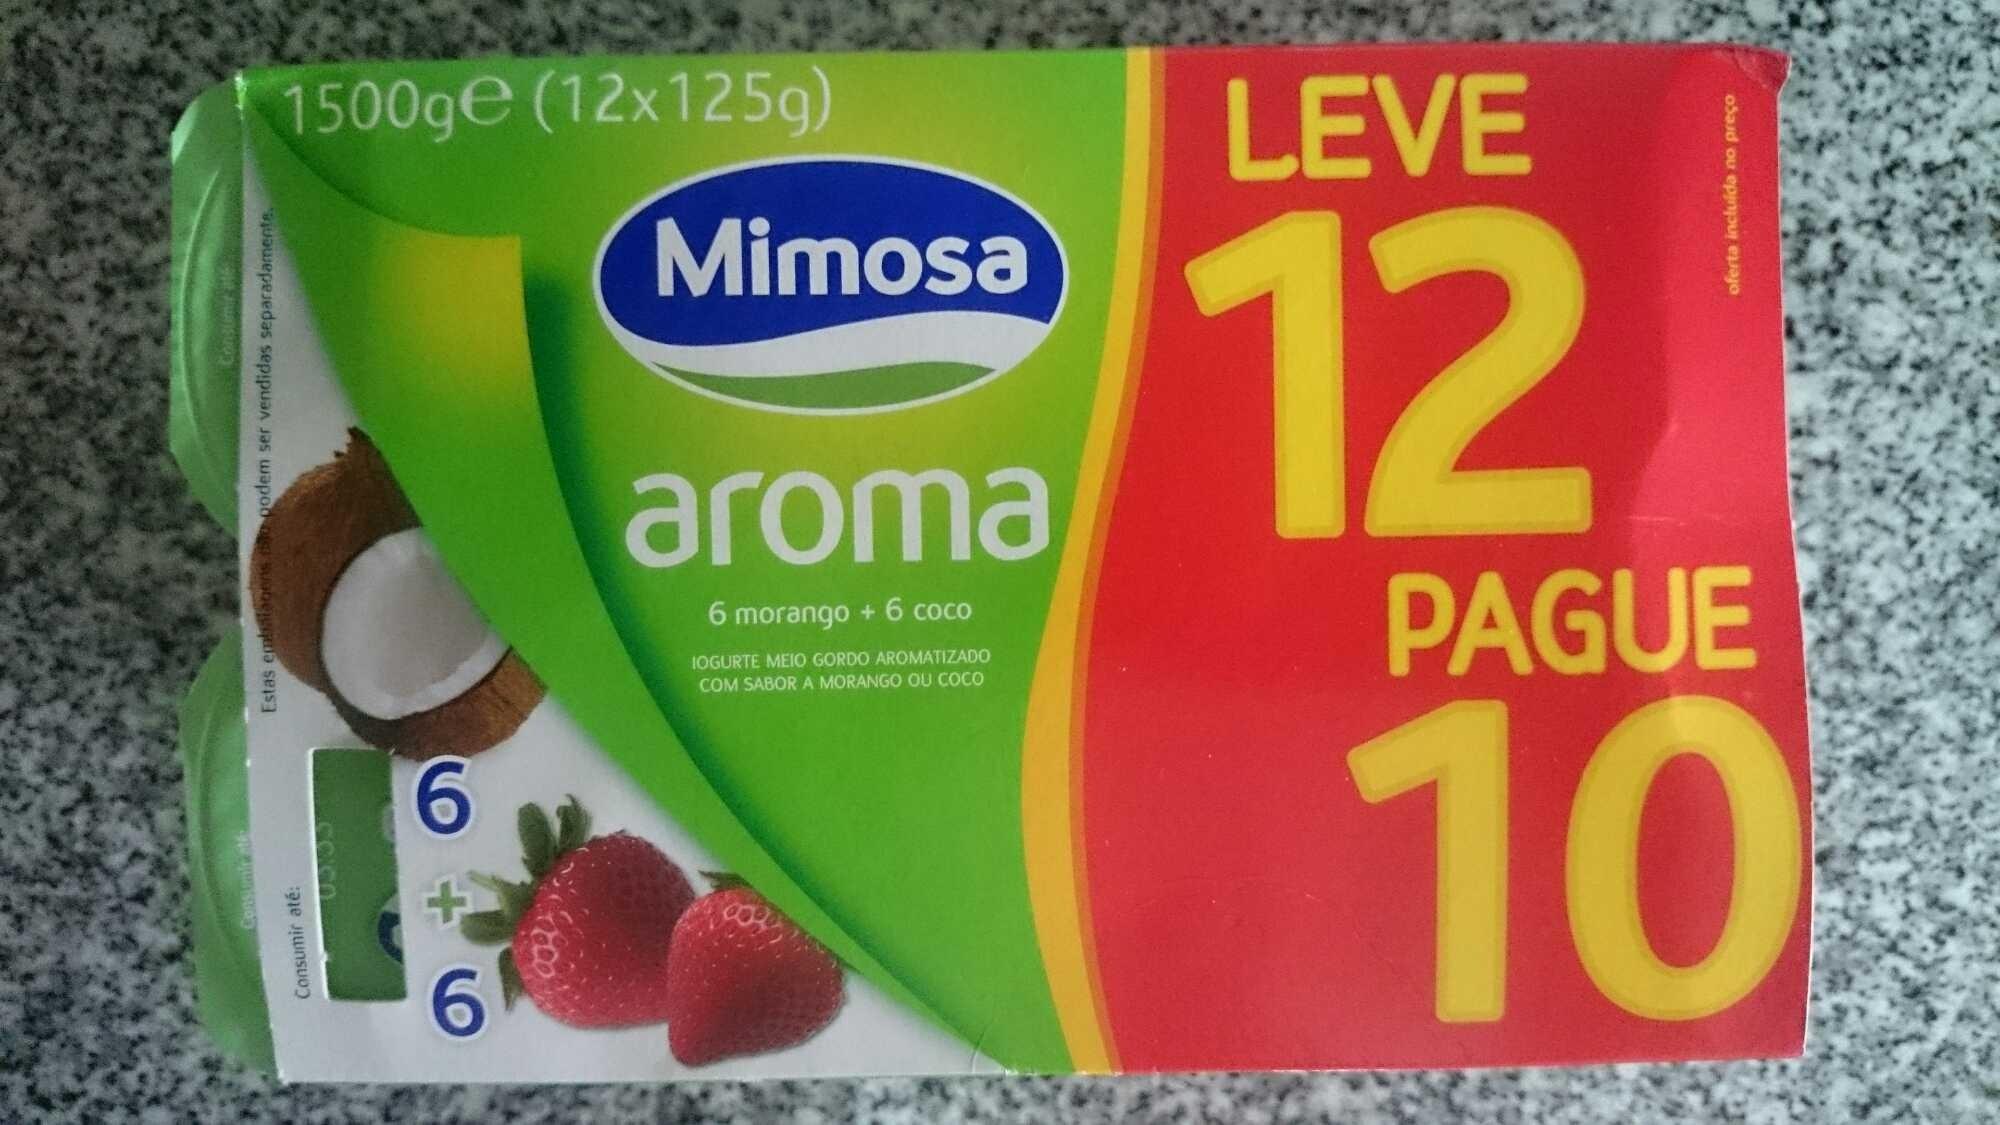 Mimosa aroma morango e coco - Product